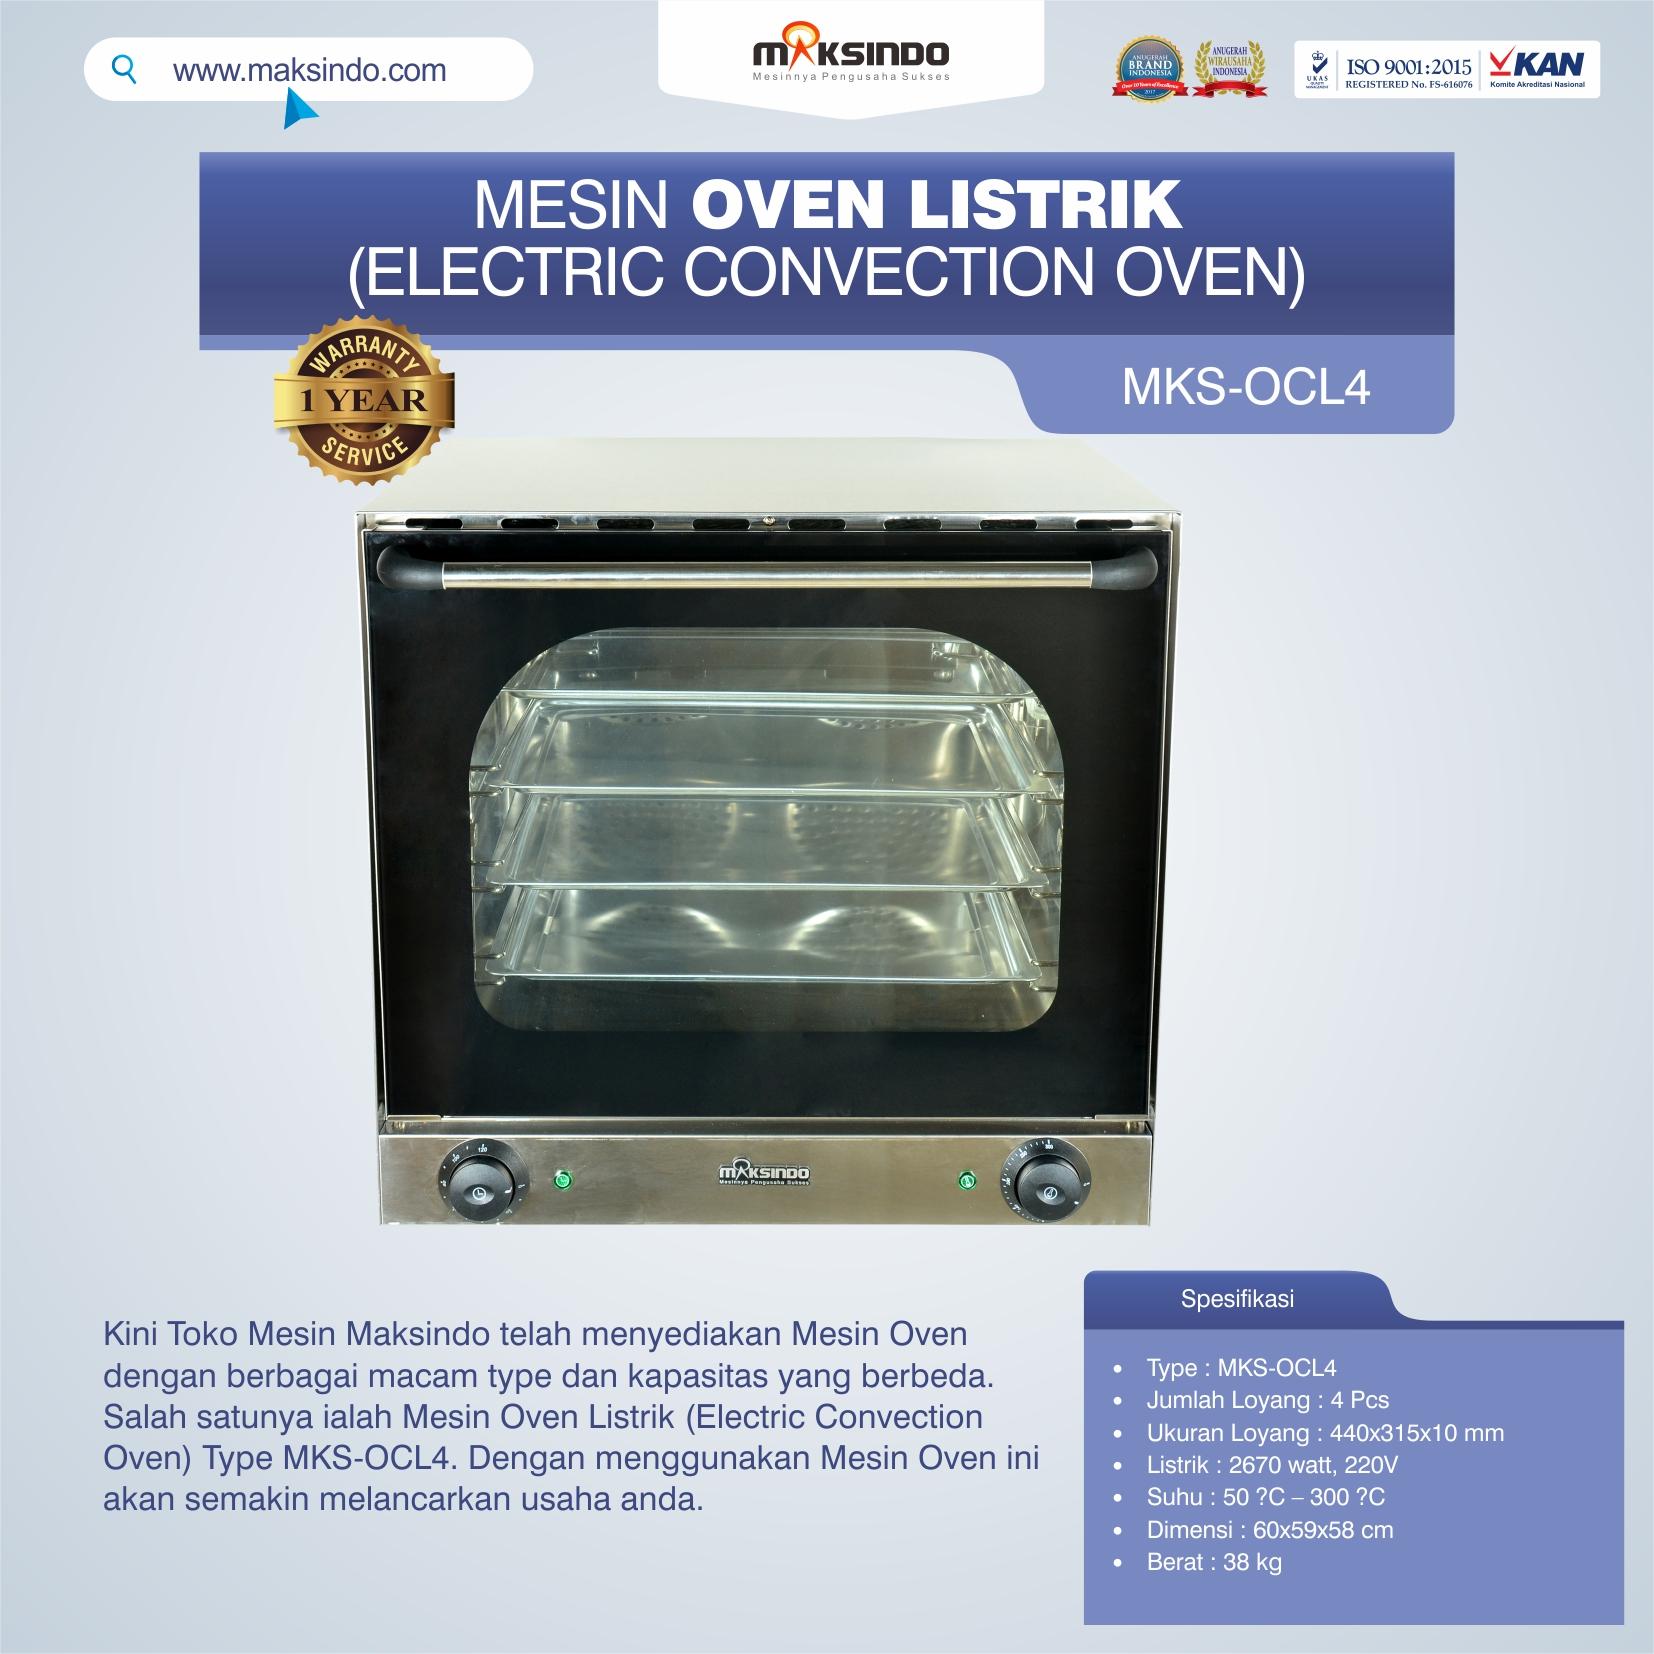 Jual Mesin Oven Listrik (Electric Convection Oven) MKS-OCL4 di Solo